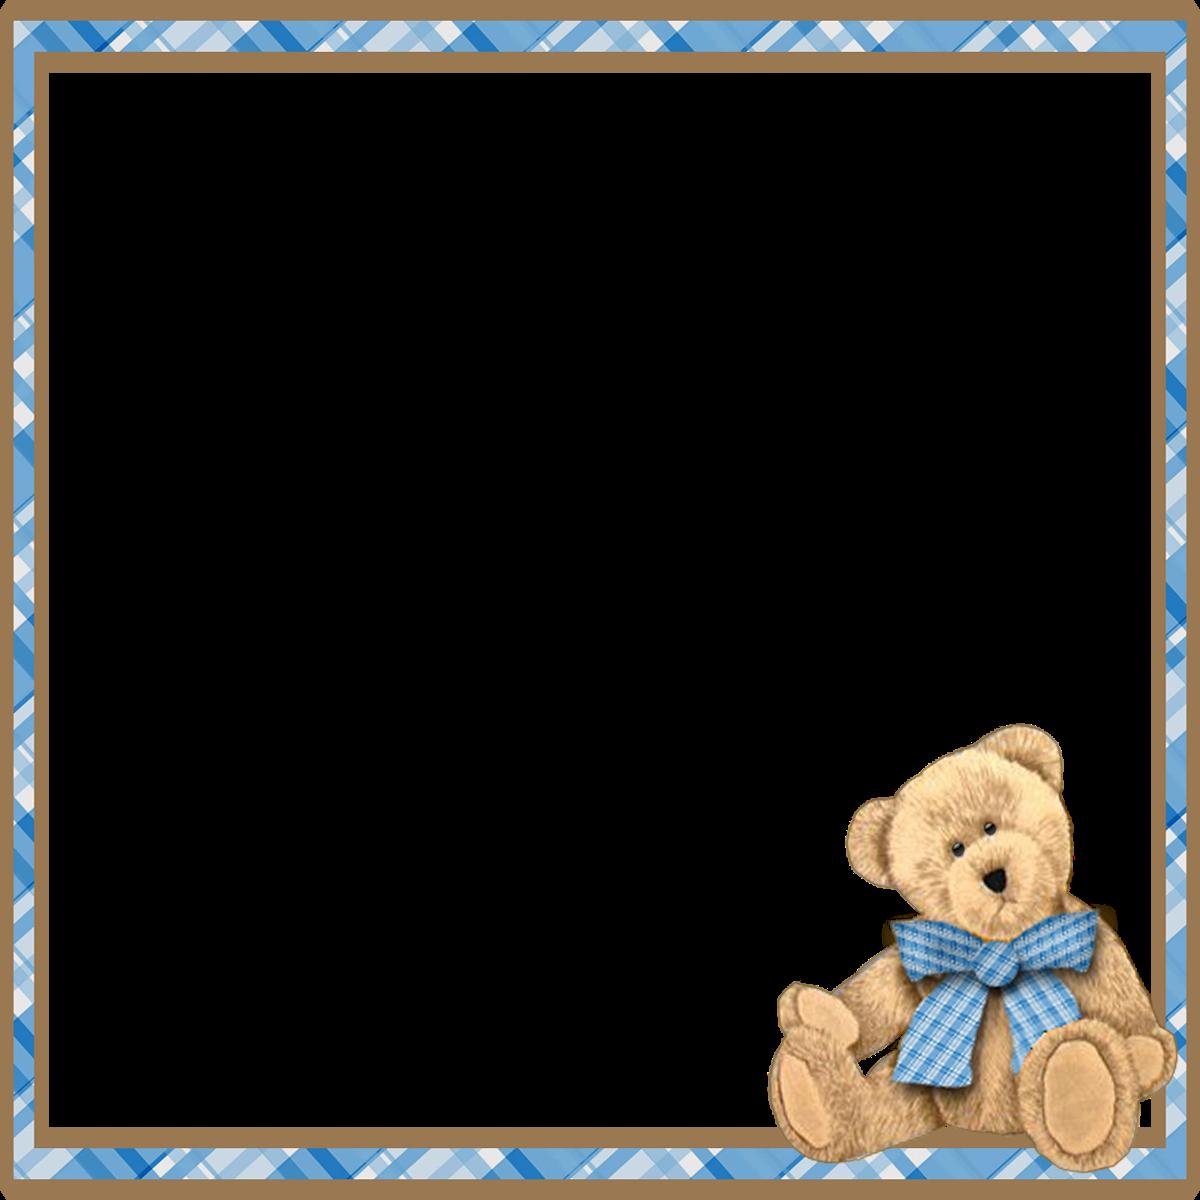 GRANNY ENCHANTED'S BLOG: Free Teddy Bear Digi Scrapbook Kit